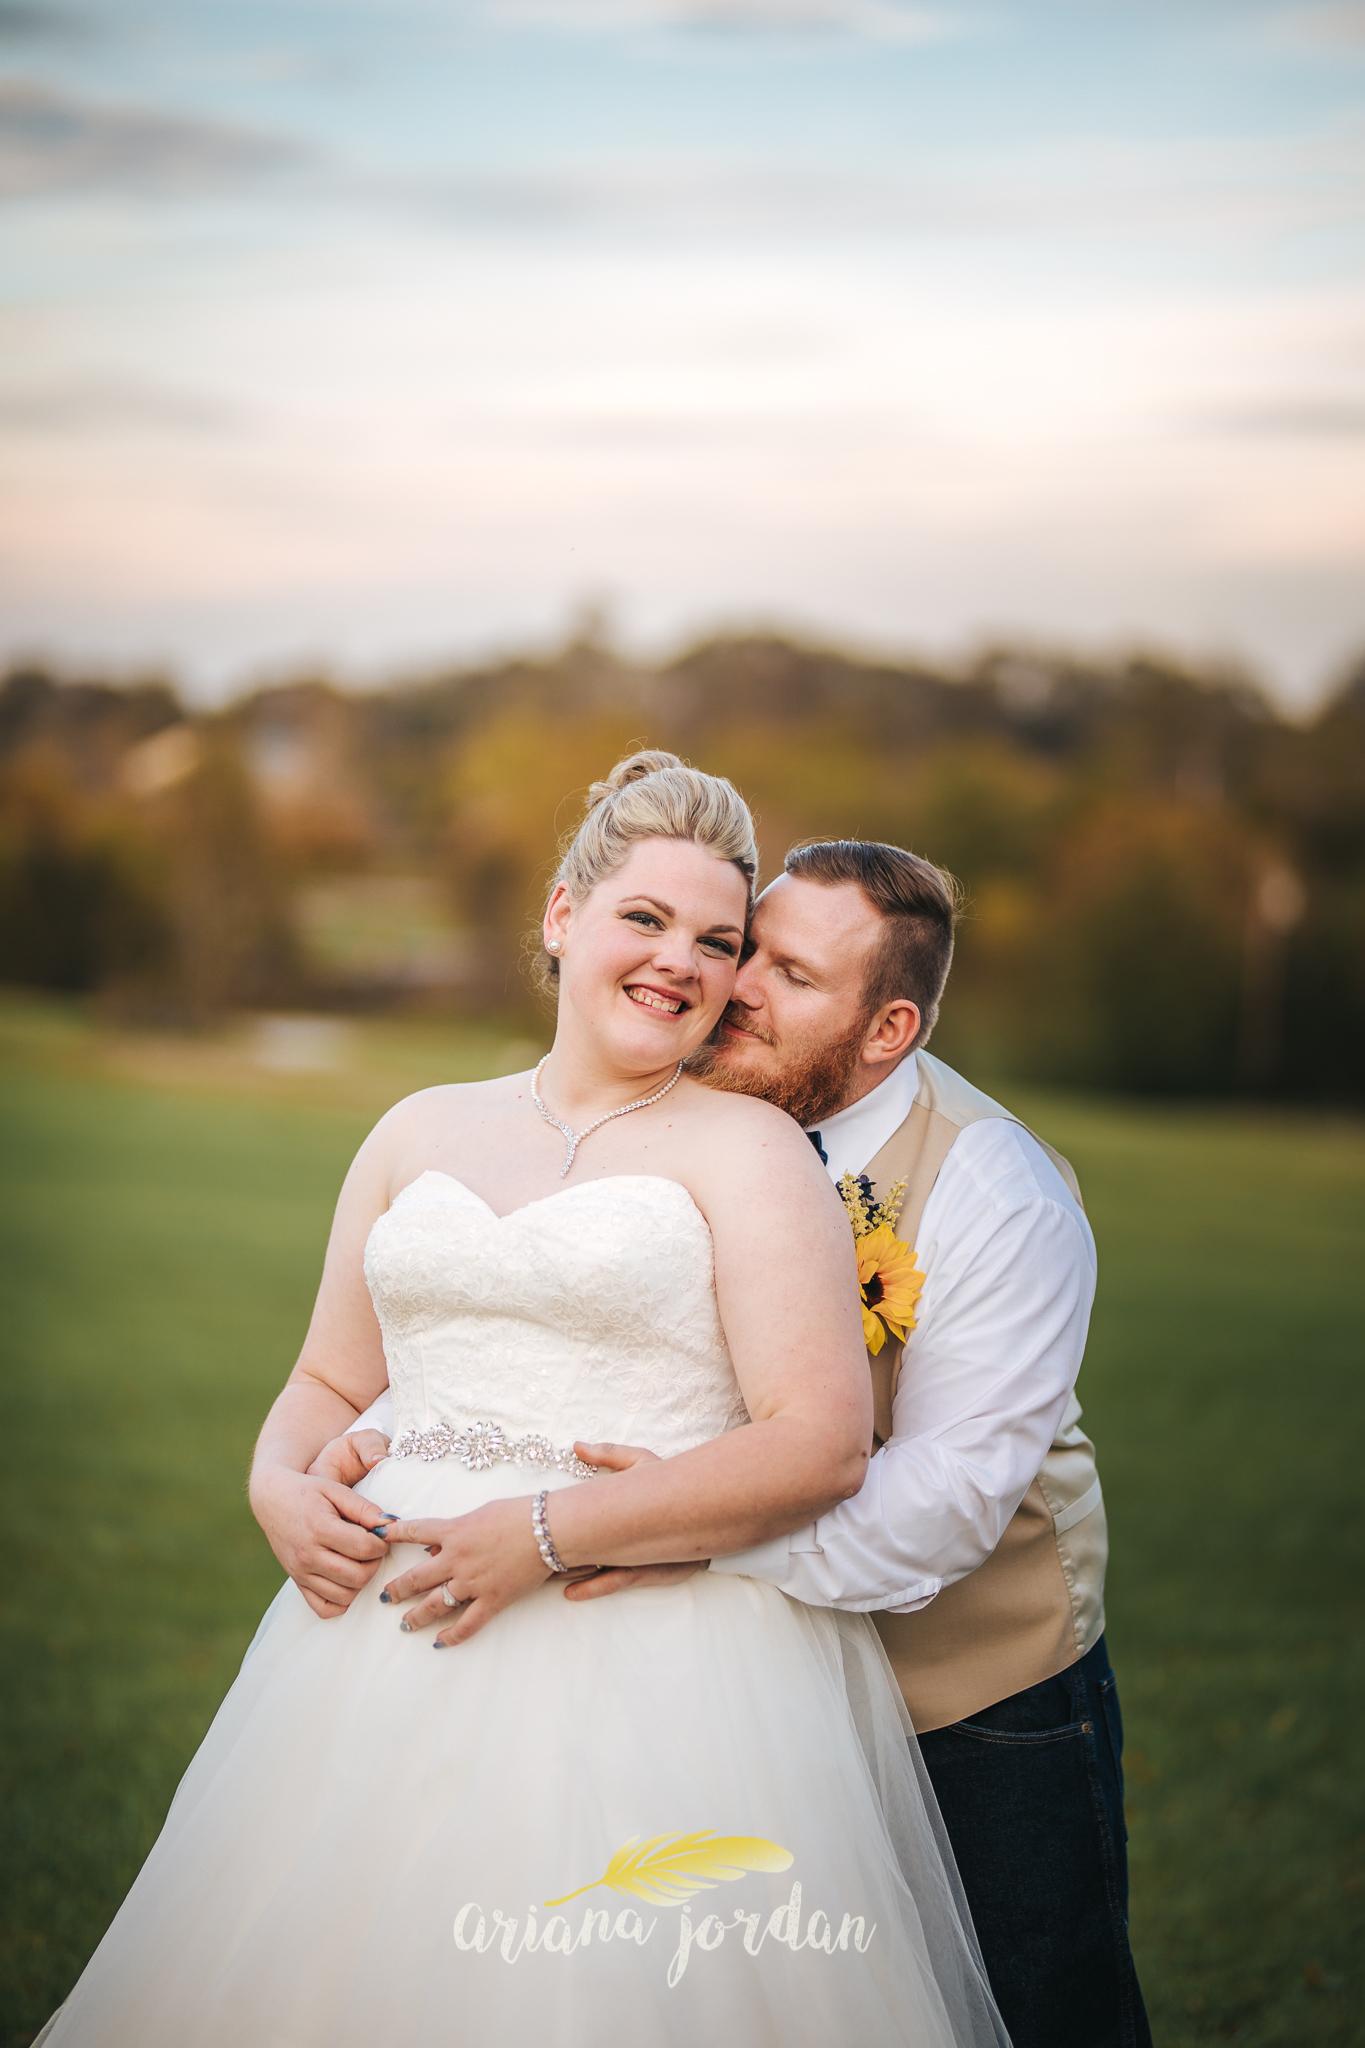 0090 Ariana Jordan Photography - Georgetown KY Wedding Photographer 6953.jpg